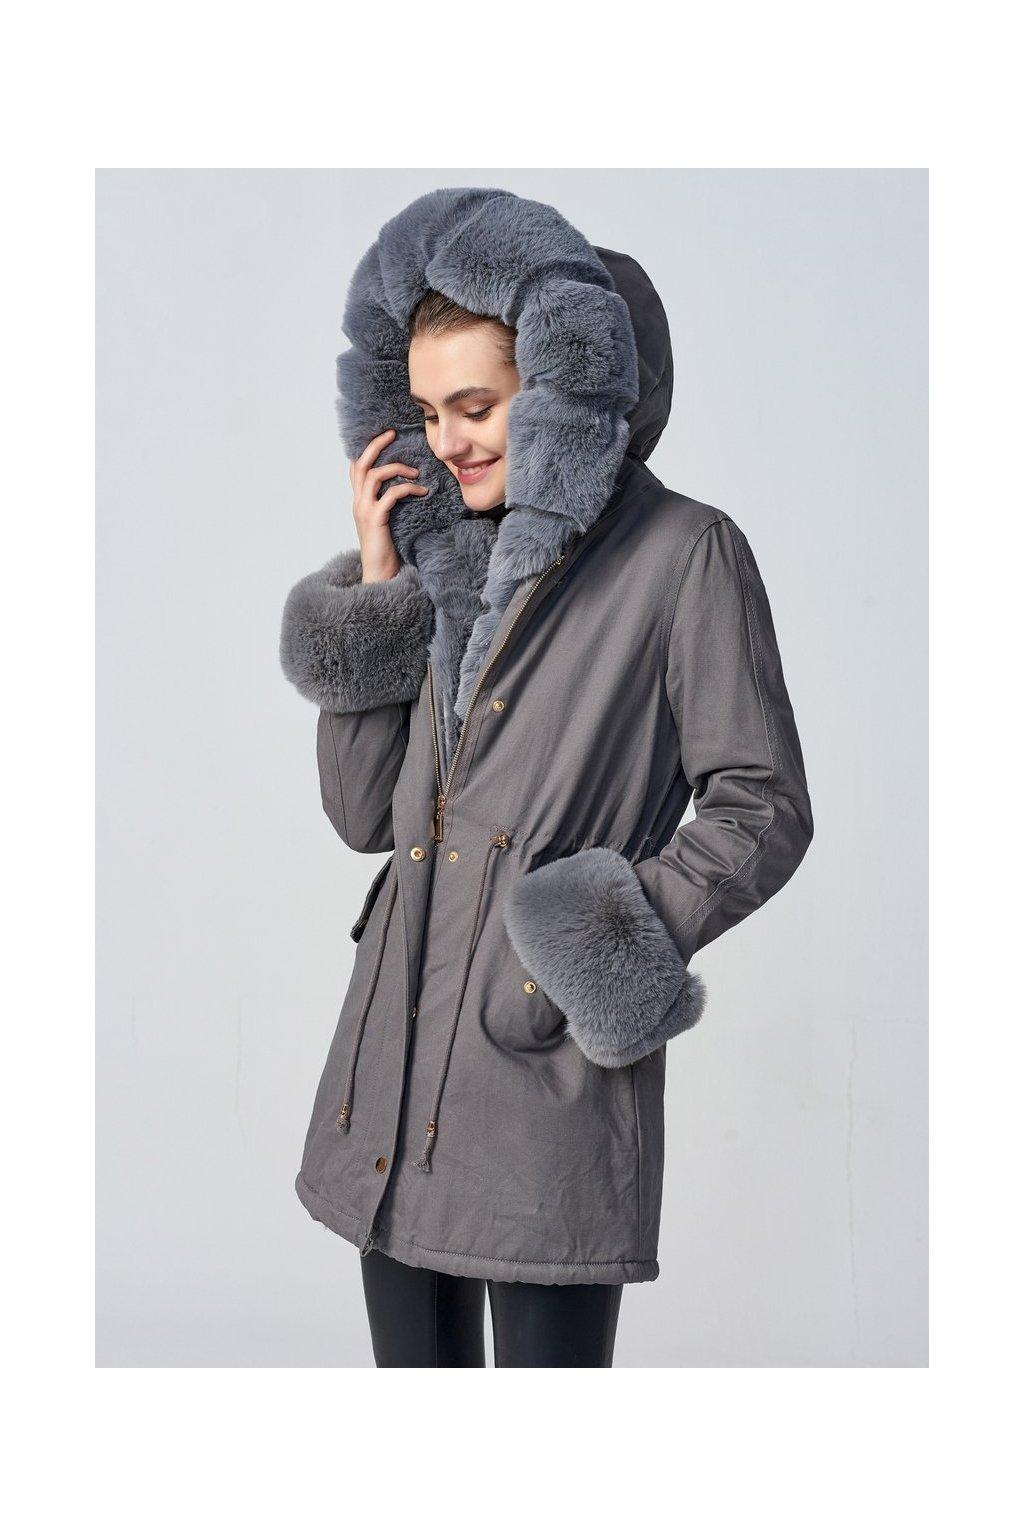 Dámska zimná bunda parka s kožušinou 3825 šedá